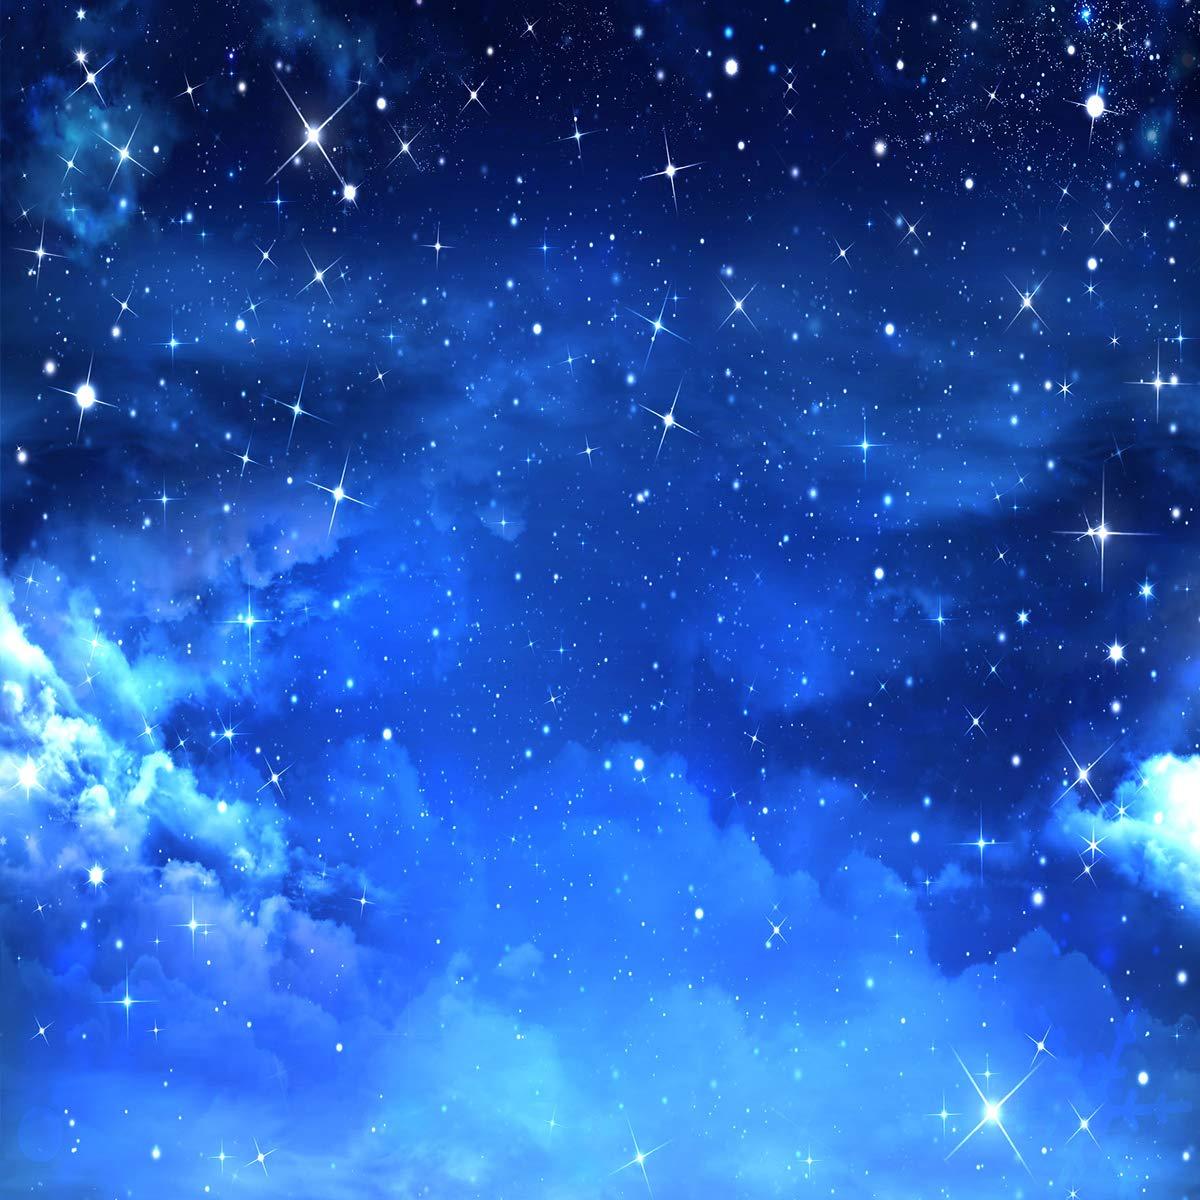 8 x 8フィート マイクロファイバー背景 星空の夜 雲 写真背景 パーティー 誕生日 背景 ベビーショー 写真ブース小道具   B07KY4FCVC